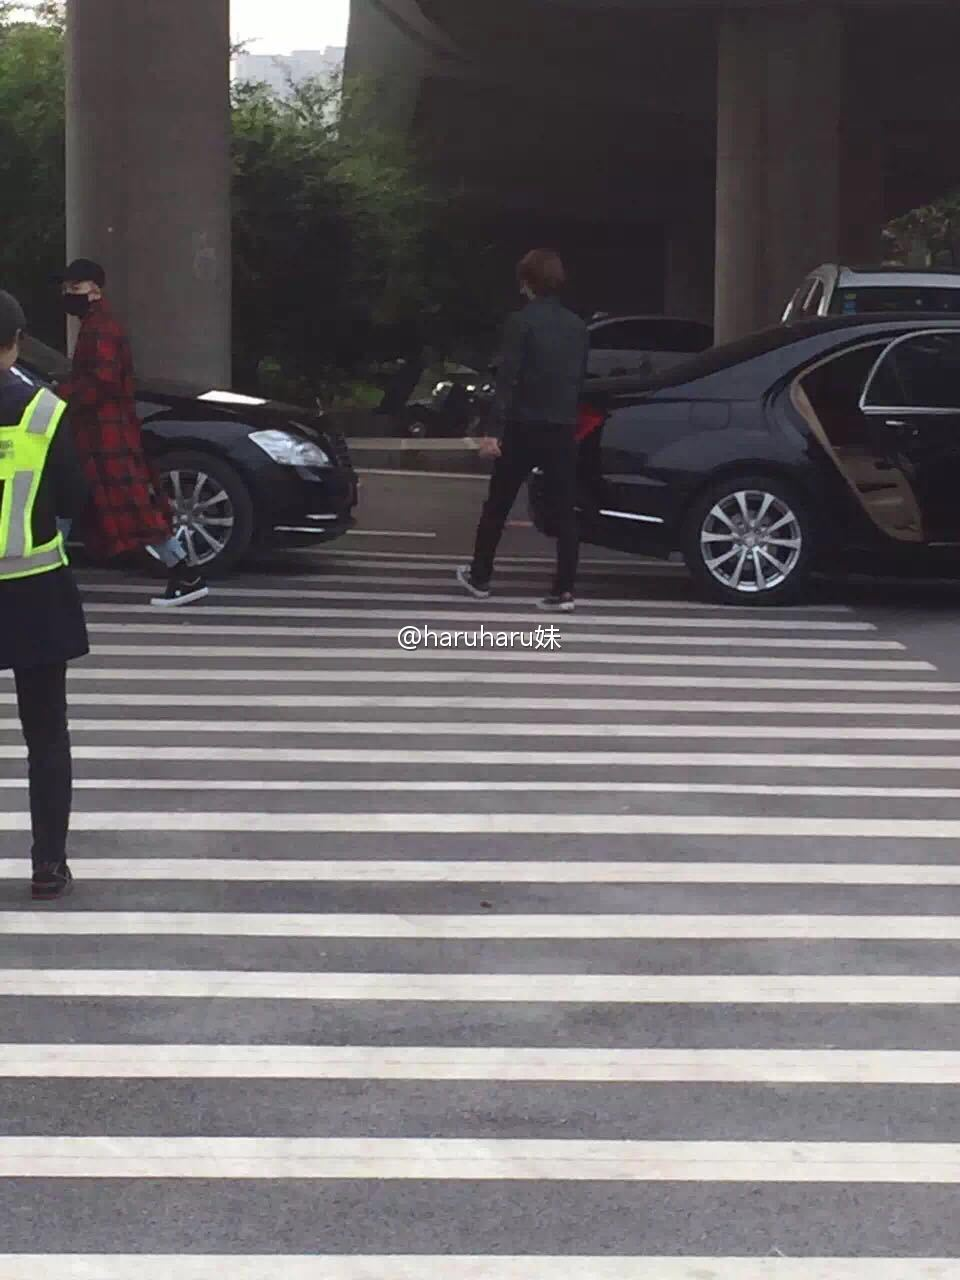 BIGBANG Arrival Changsha 2016-03-26 Echoing 妹 (3)